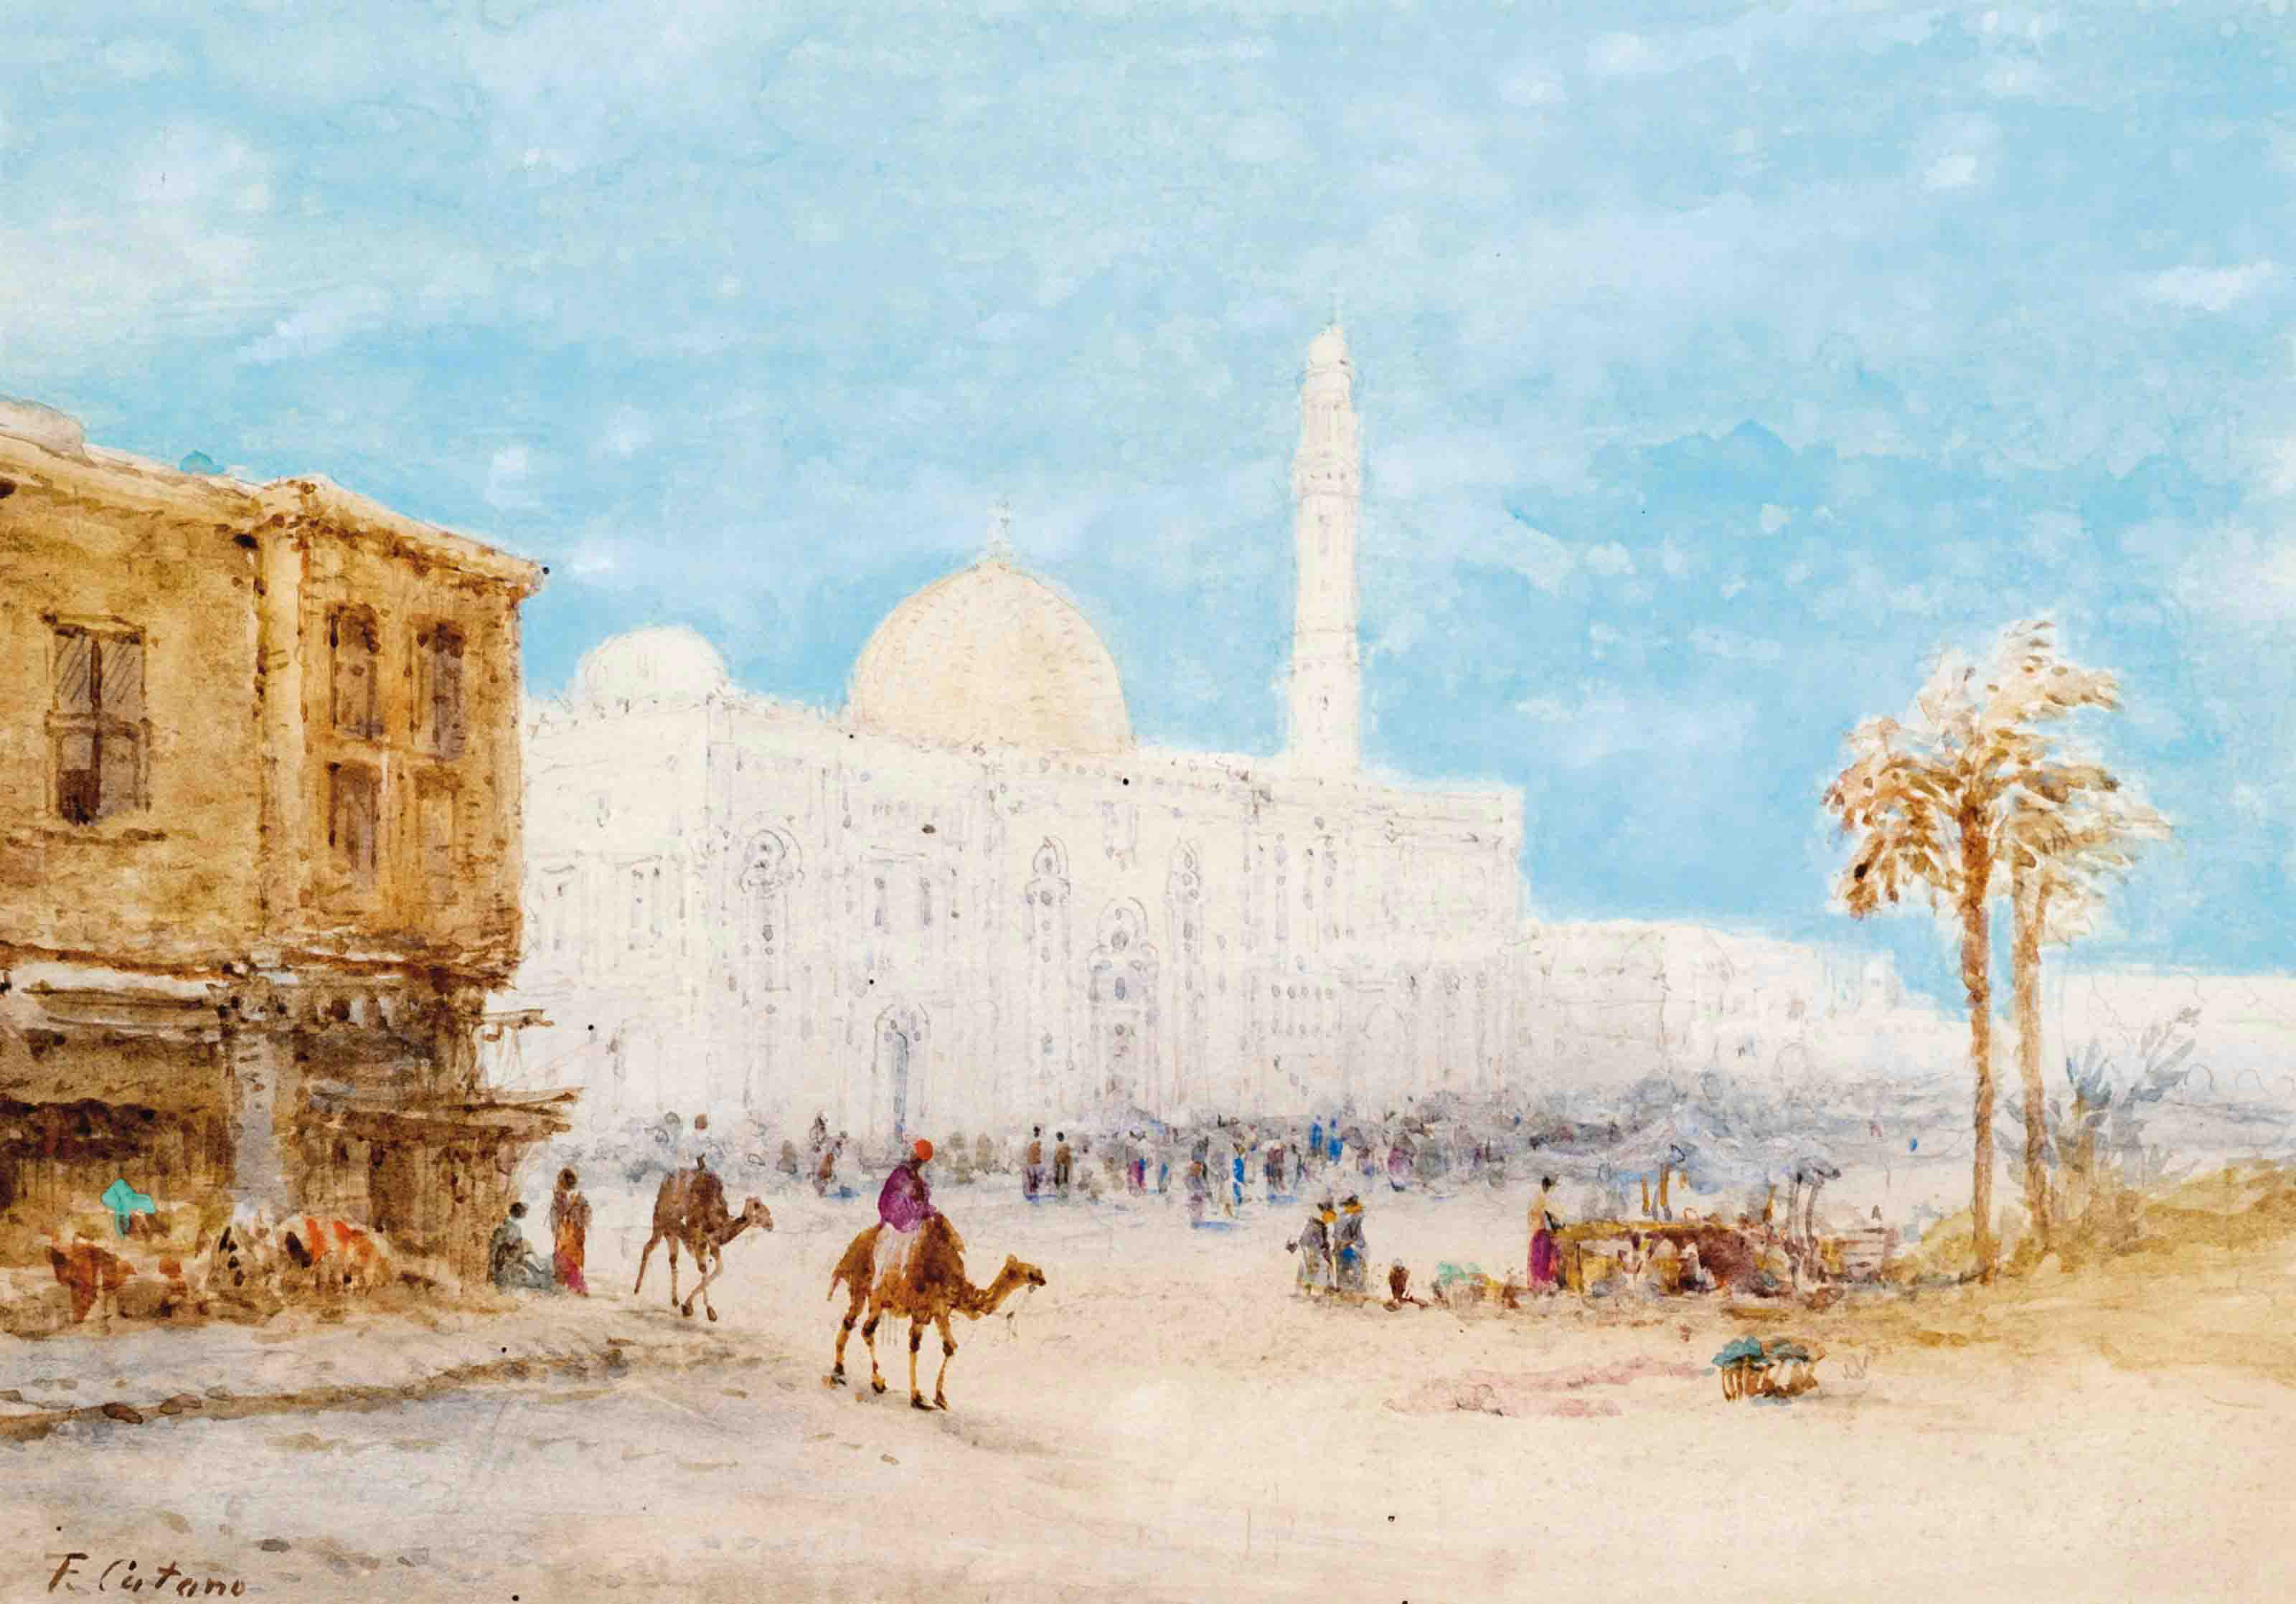 A bazaar and mosque complex